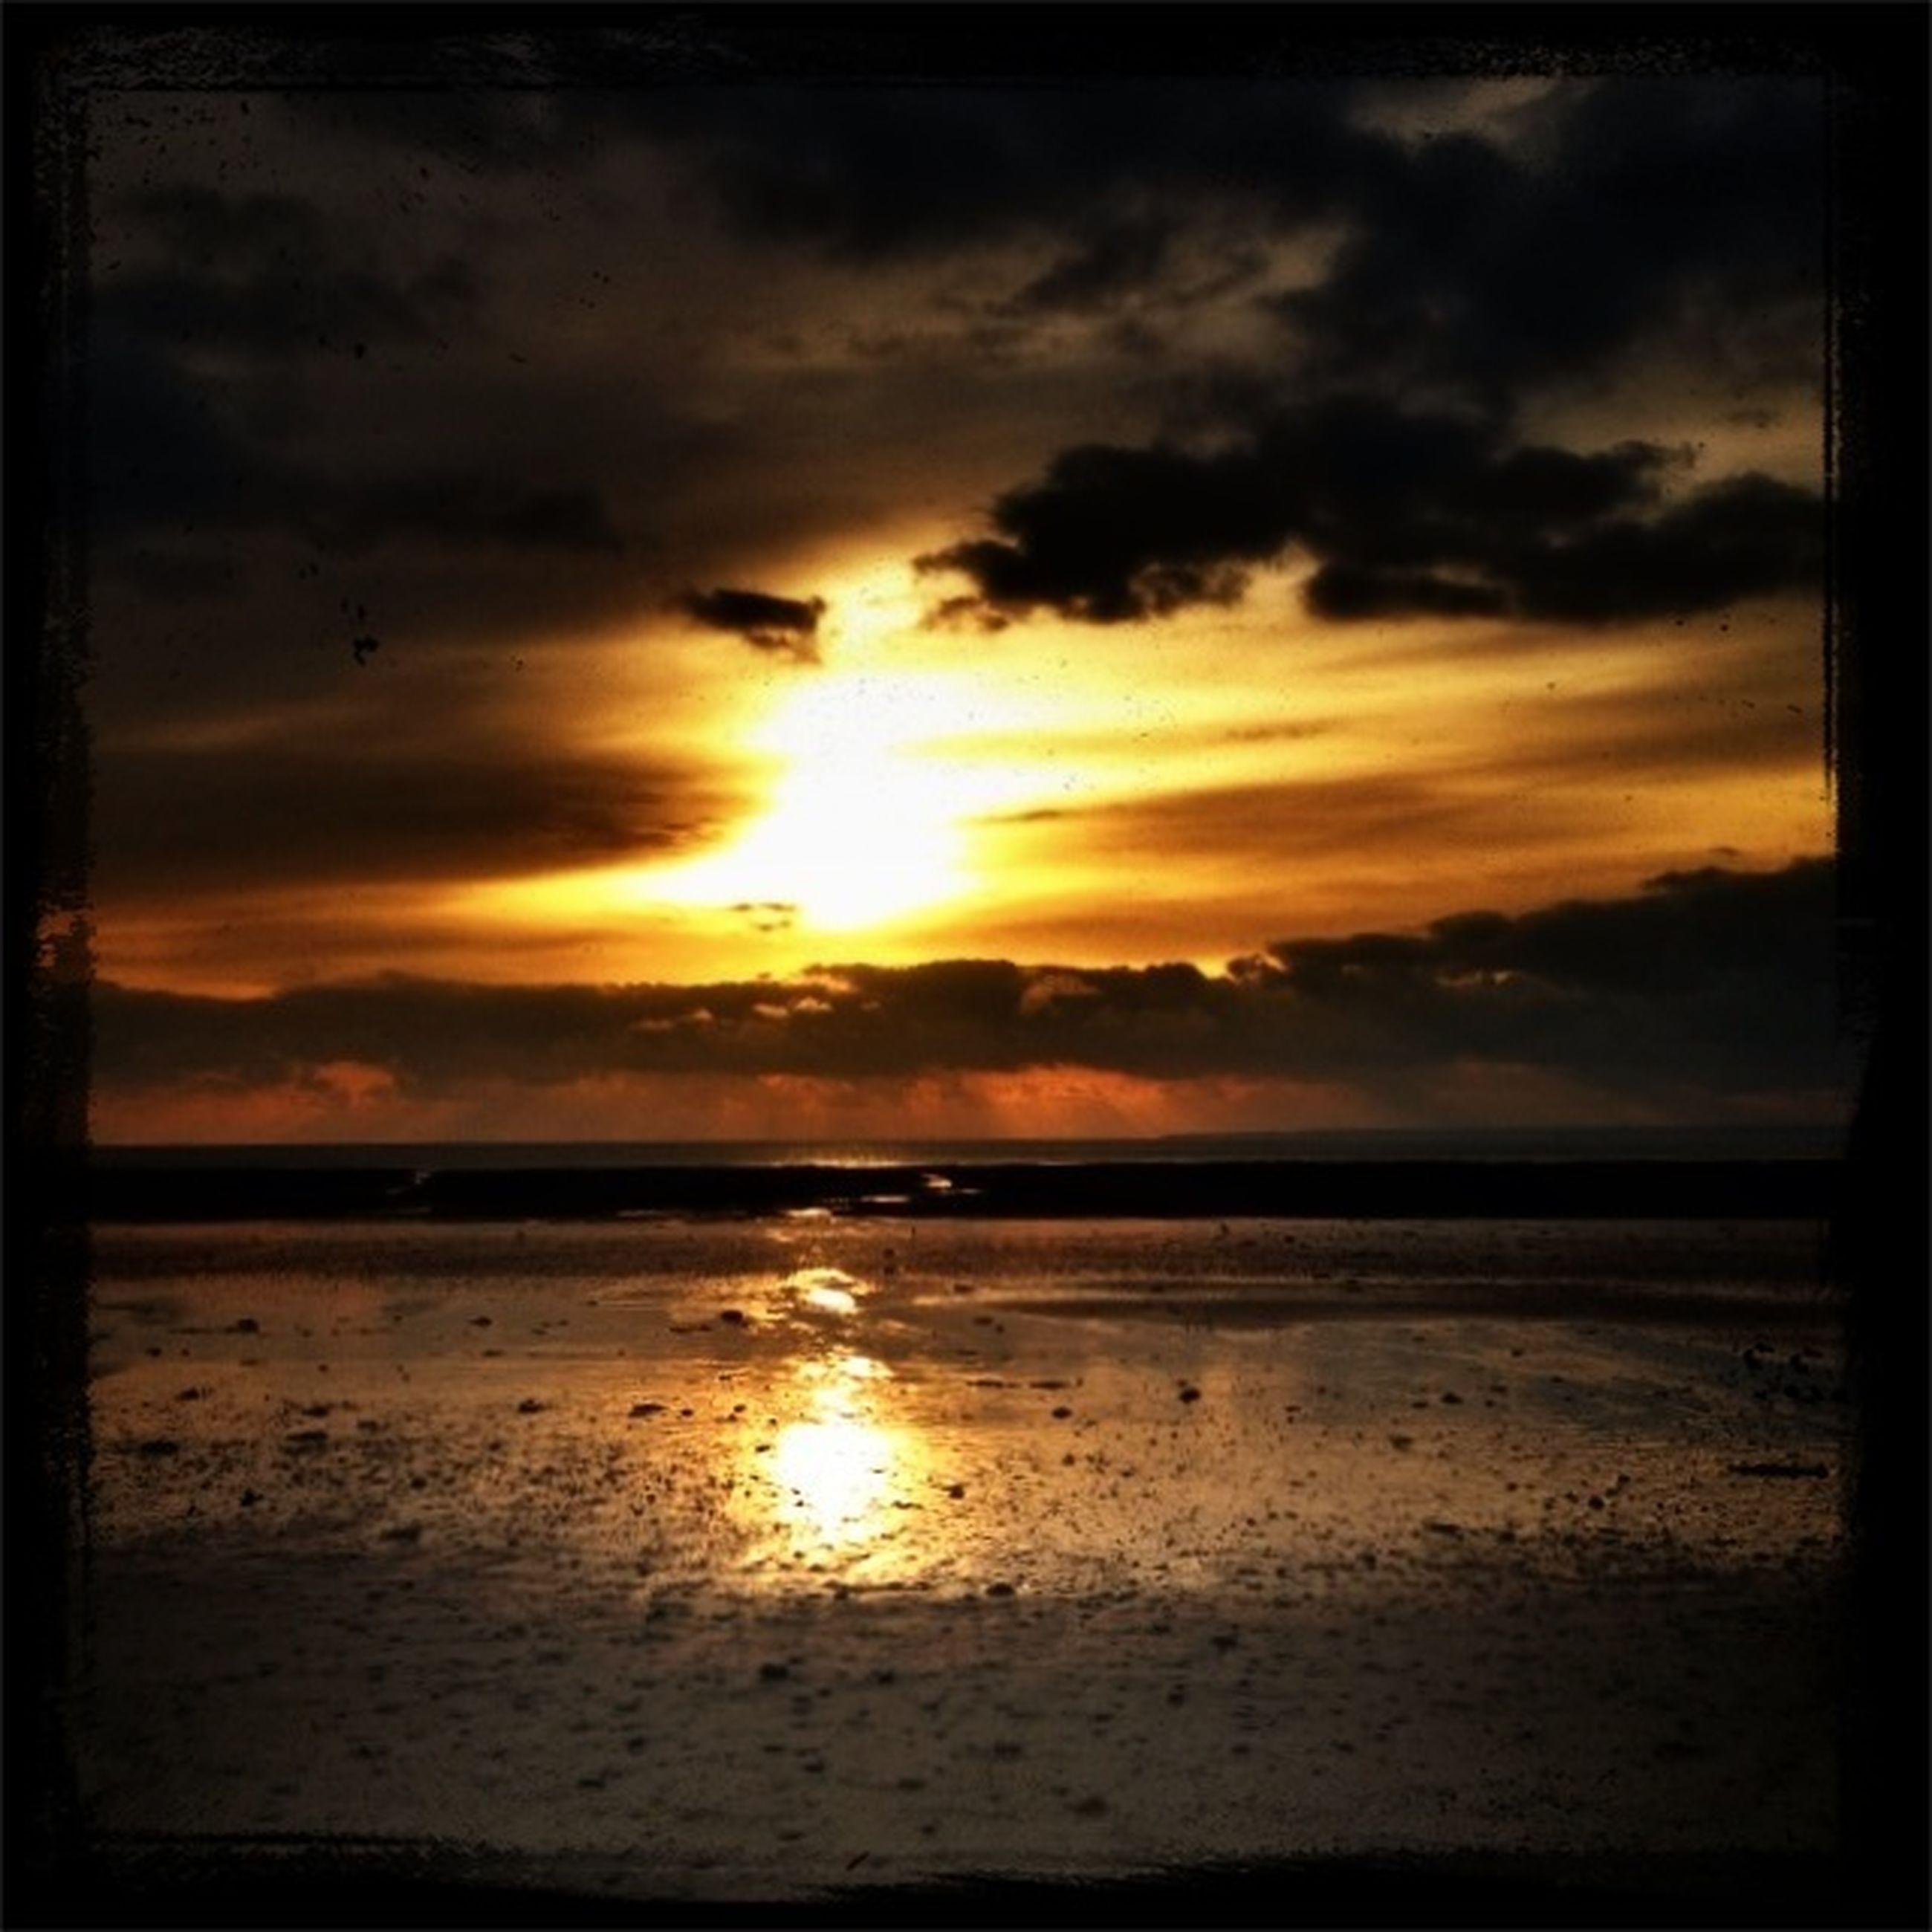 sunset, sun, water, scenics, sky, tranquil scene, sea, beauty in nature, tranquility, cloud - sky, reflection, beach, horizon over water, orange color, idyllic, nature, sunlight, sunbeam, shore, transfer print